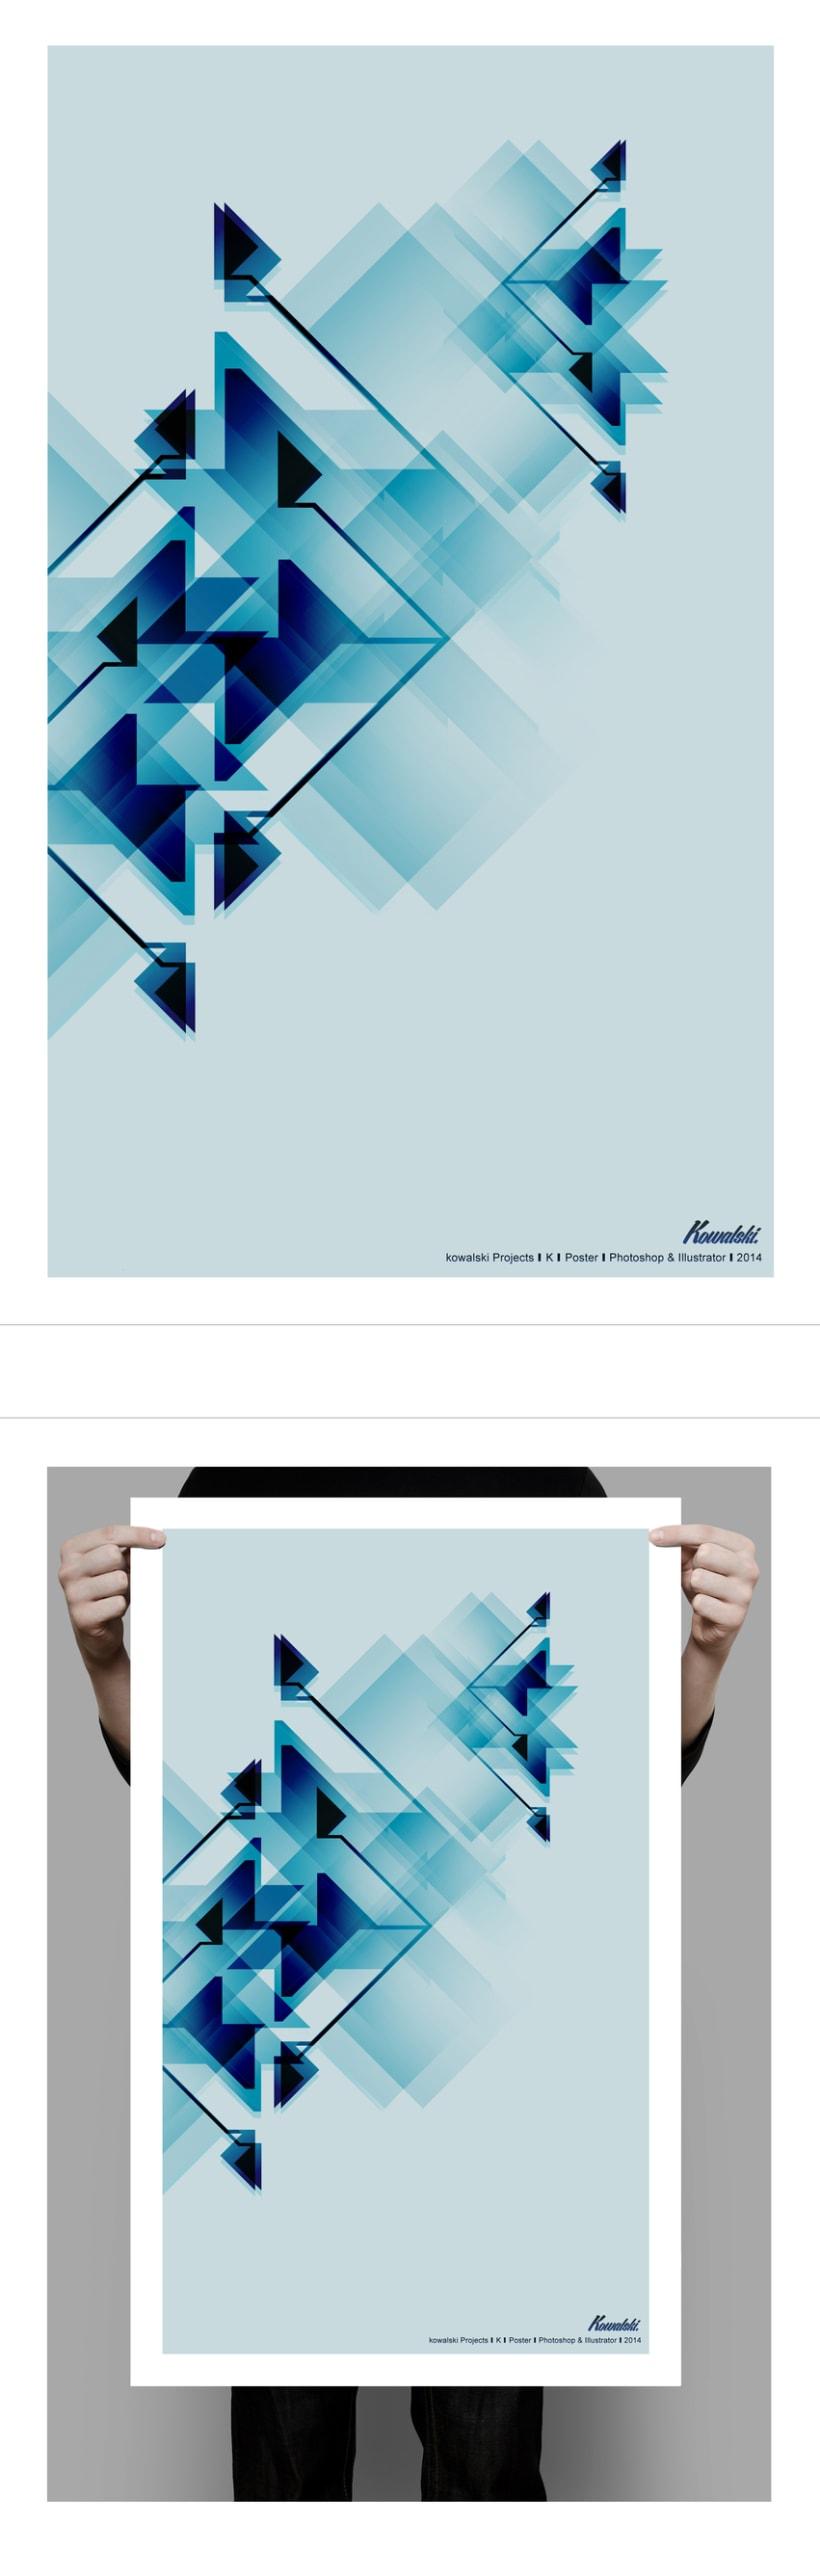 Kowalski Projekts / Illustration - K -    -1